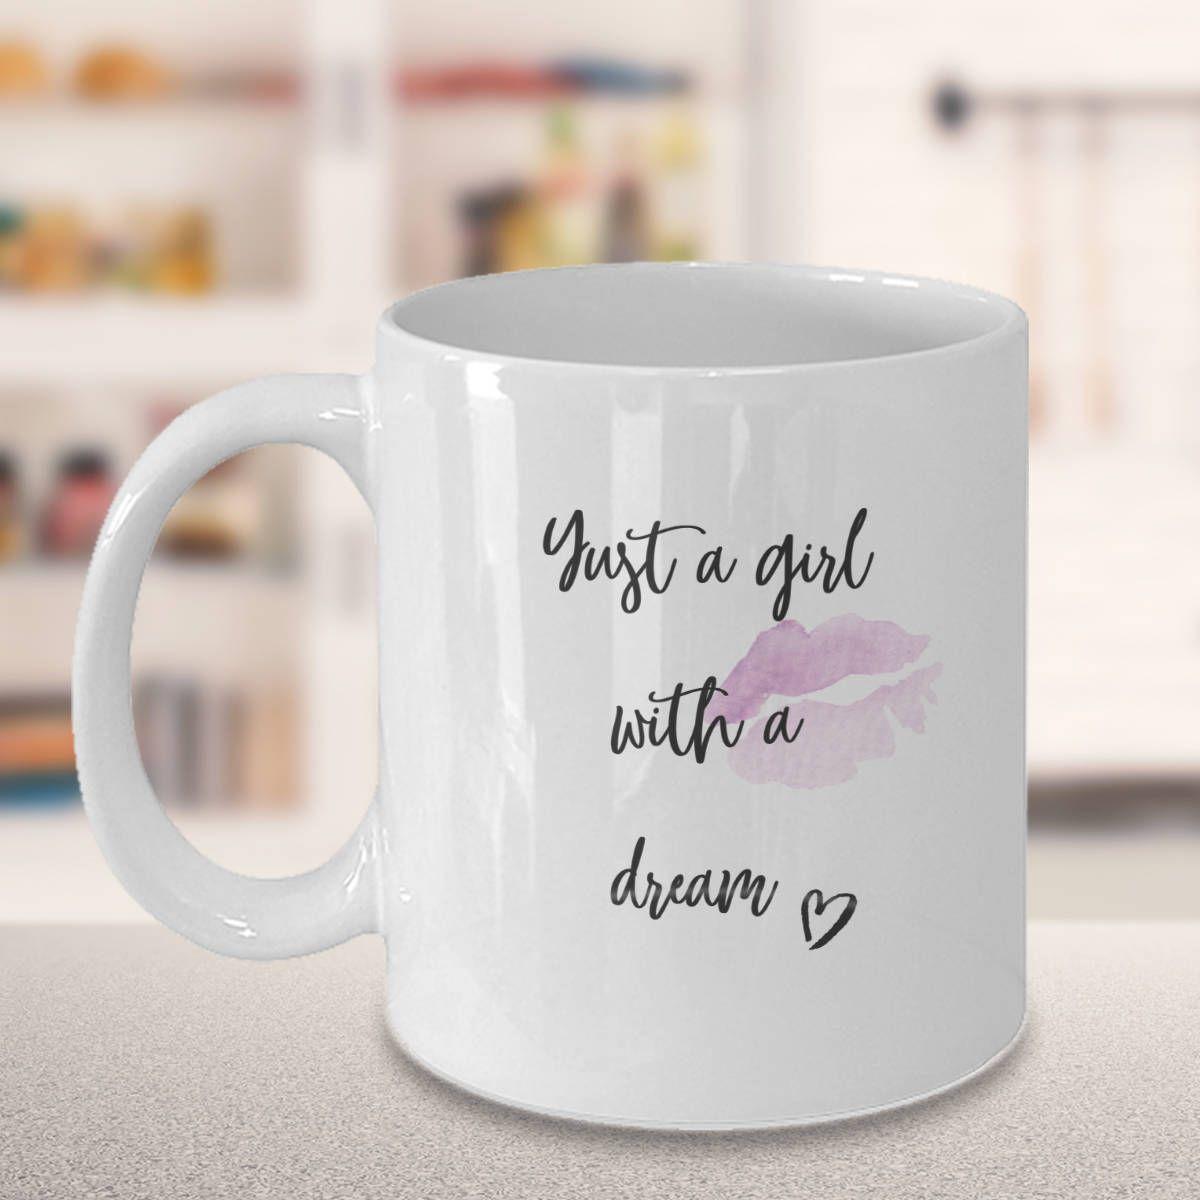 Female Gifts Female Gifts Birthday Female Gifts Birthday Your